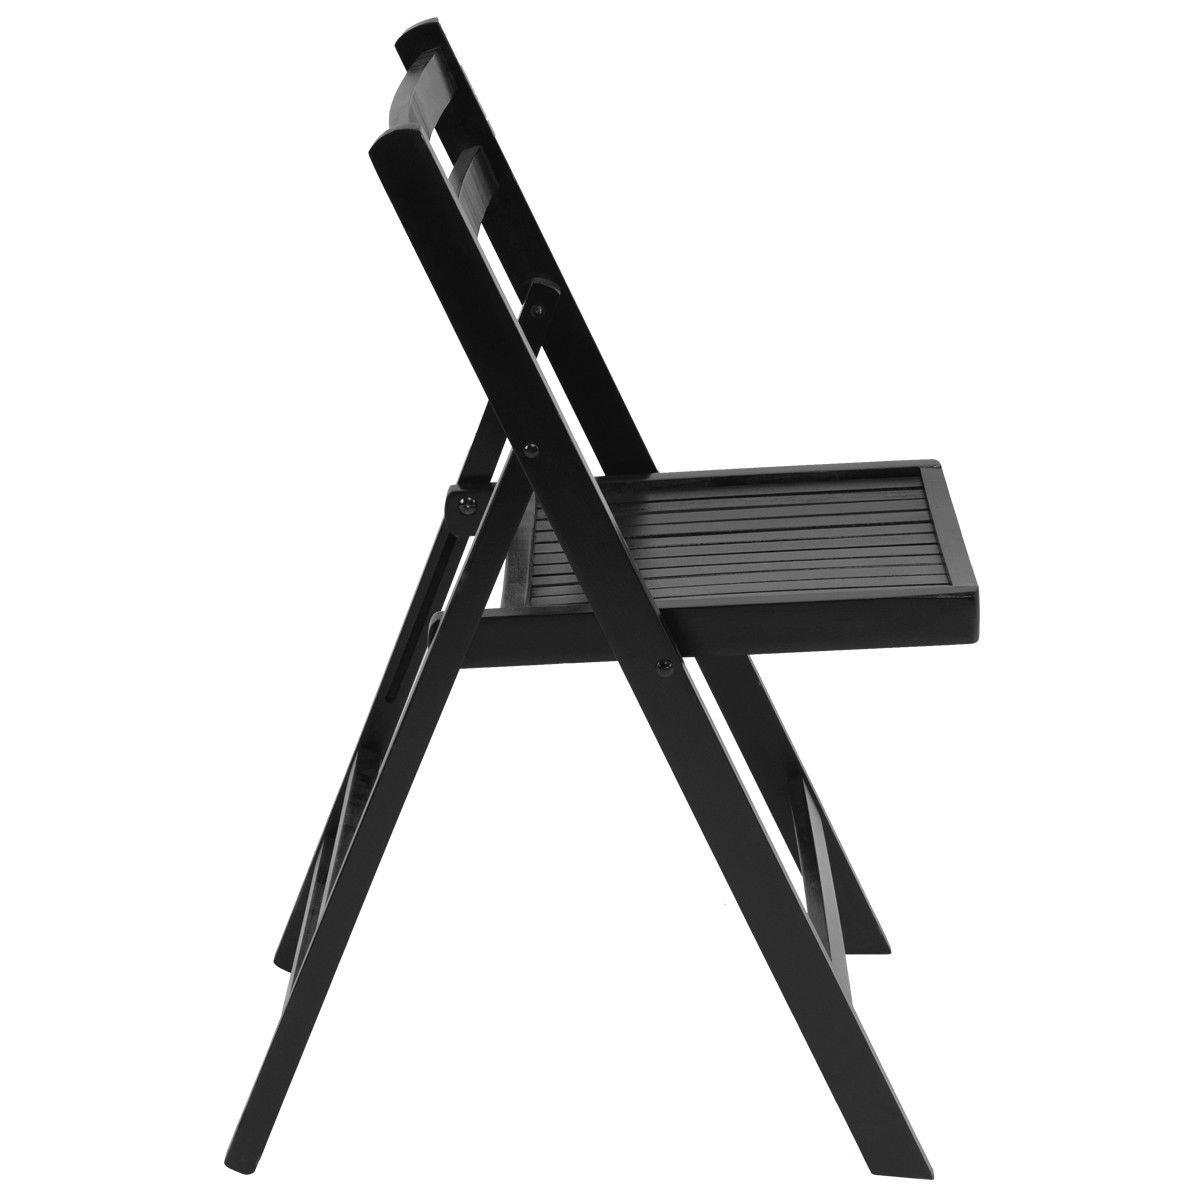 Amazon.com: FDInspiration - Juego de 4 sillas plegables de ...